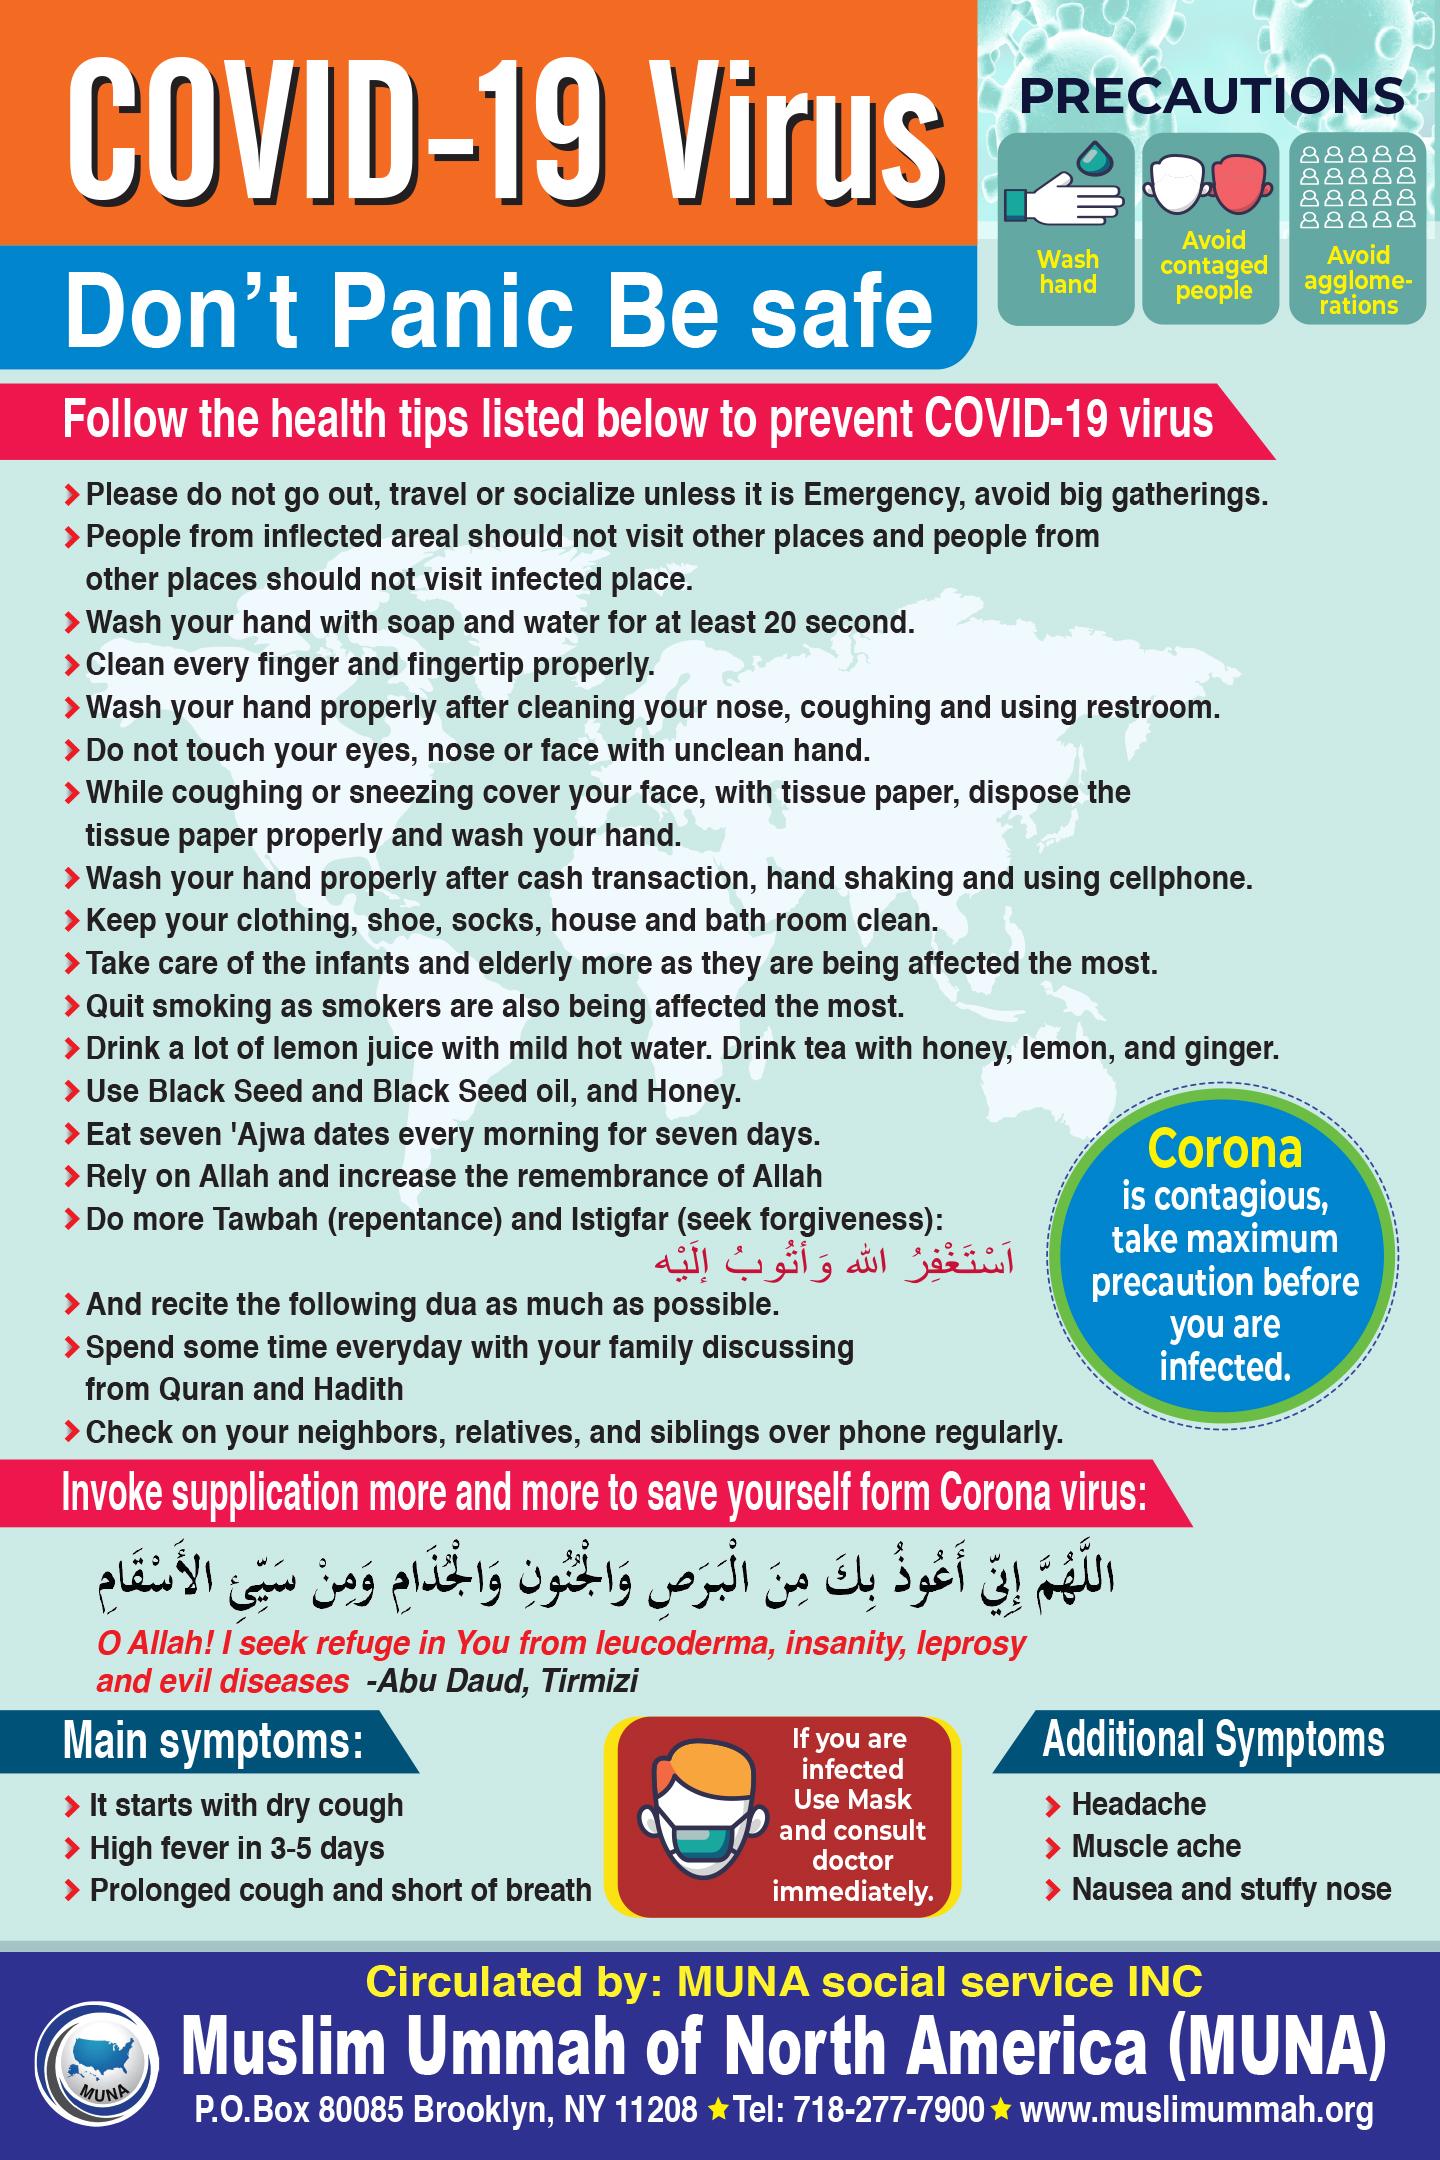 COVID-19 Virus, Don't panic be safe, Bangla-English Flyer